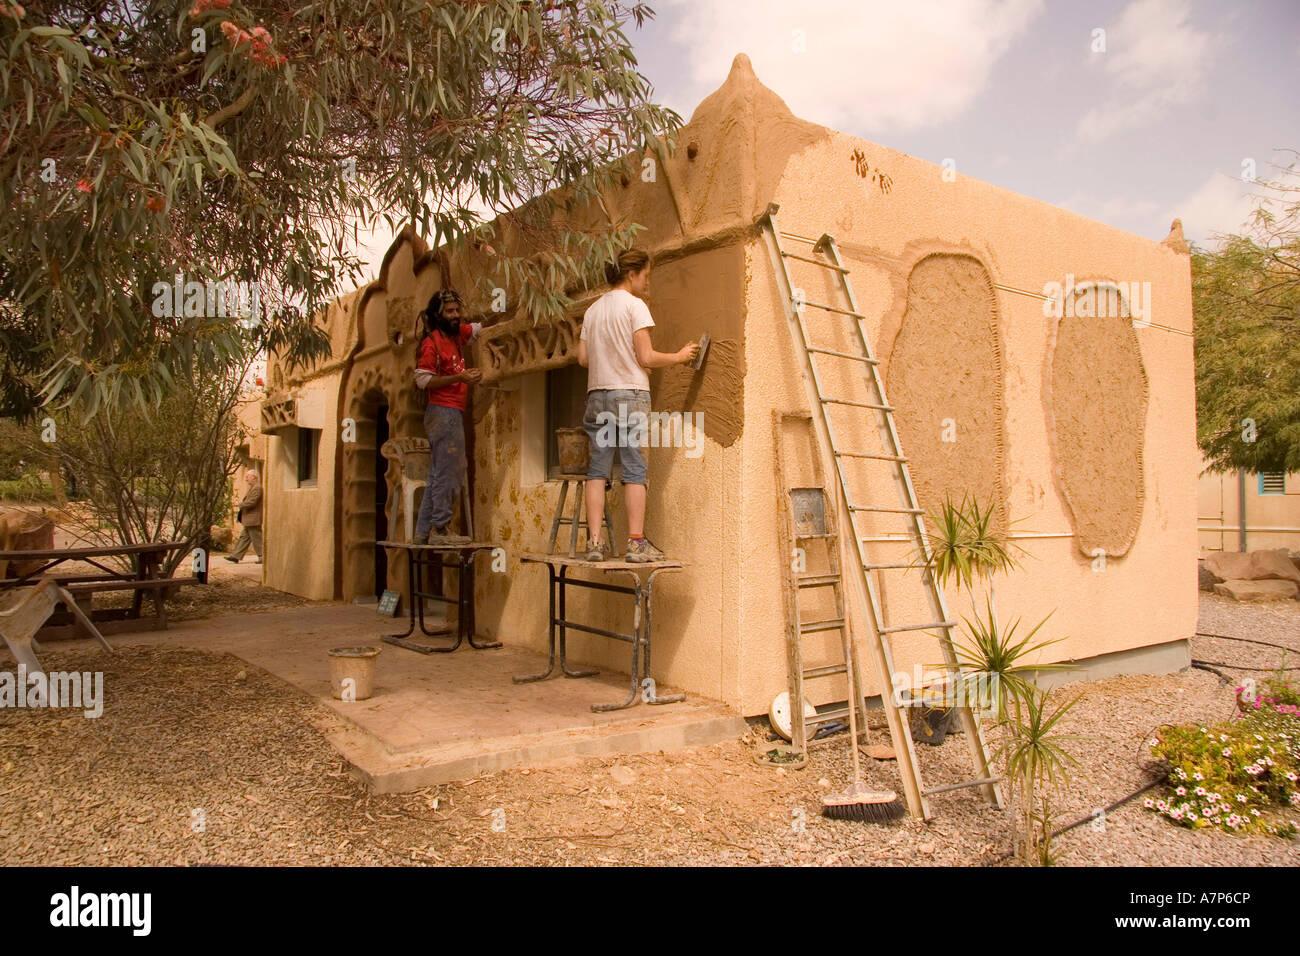 Diy mud brick house